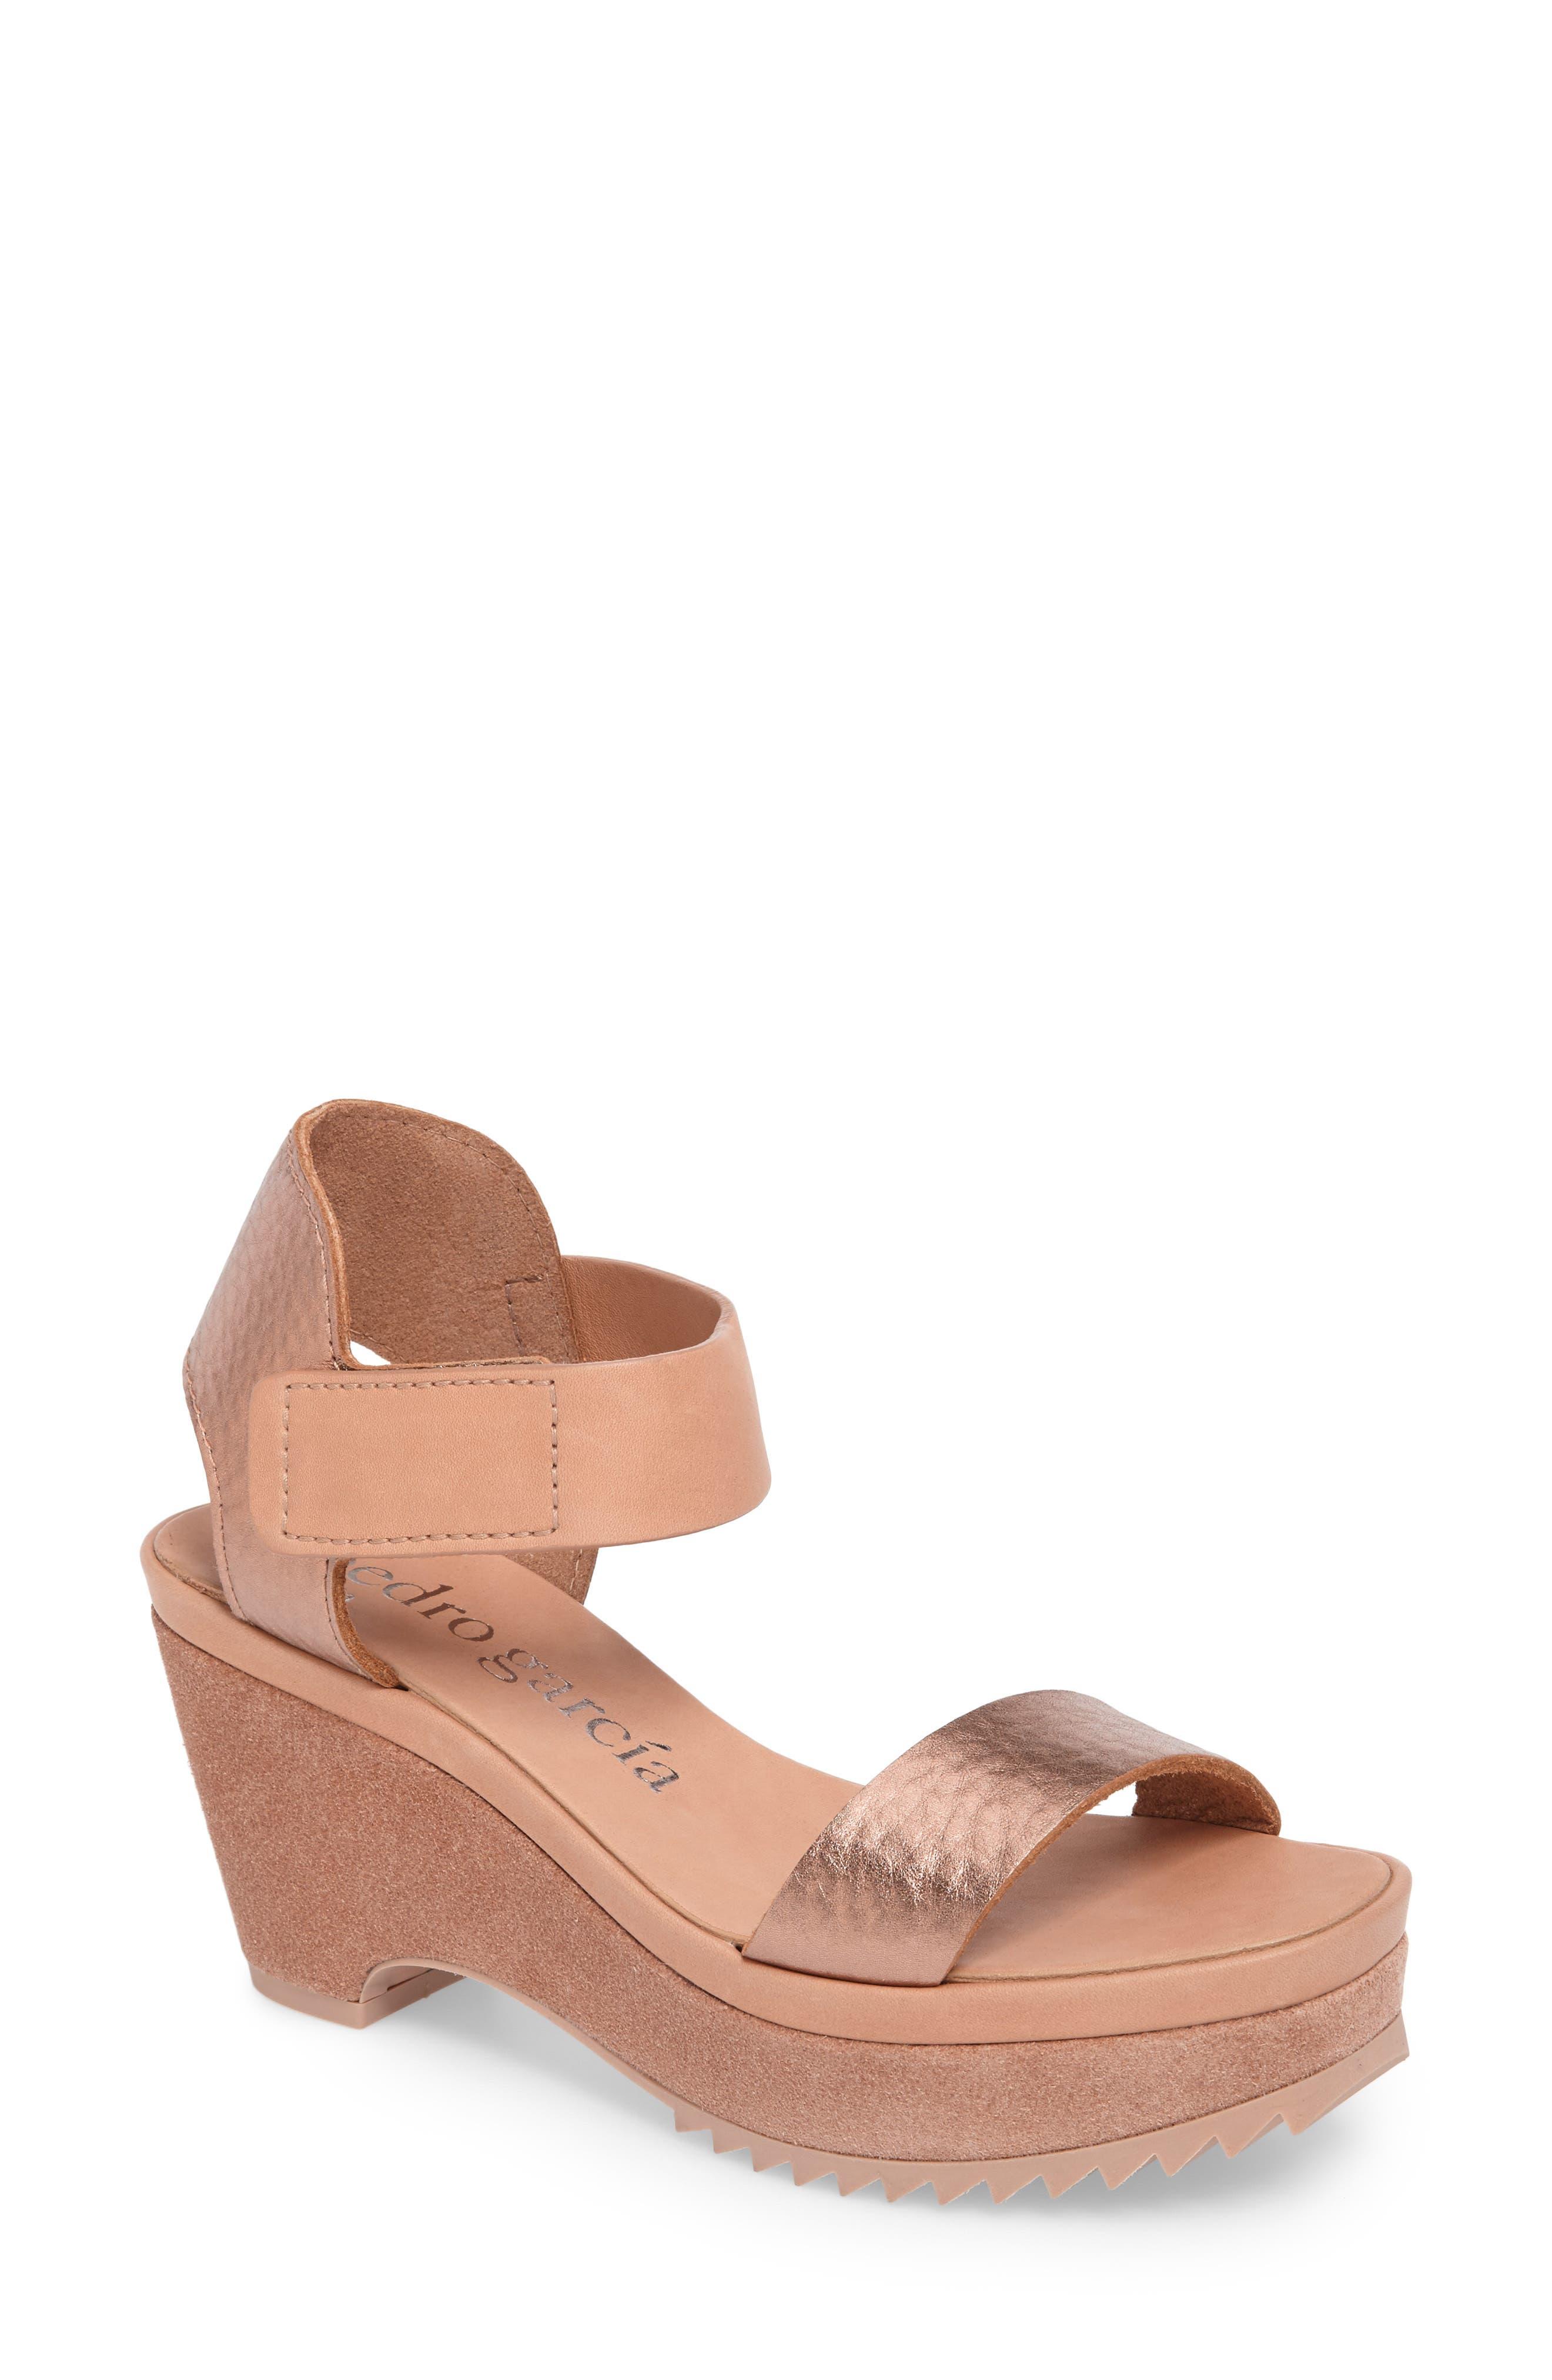 82b380f3ace Pedro Garcia Shoes